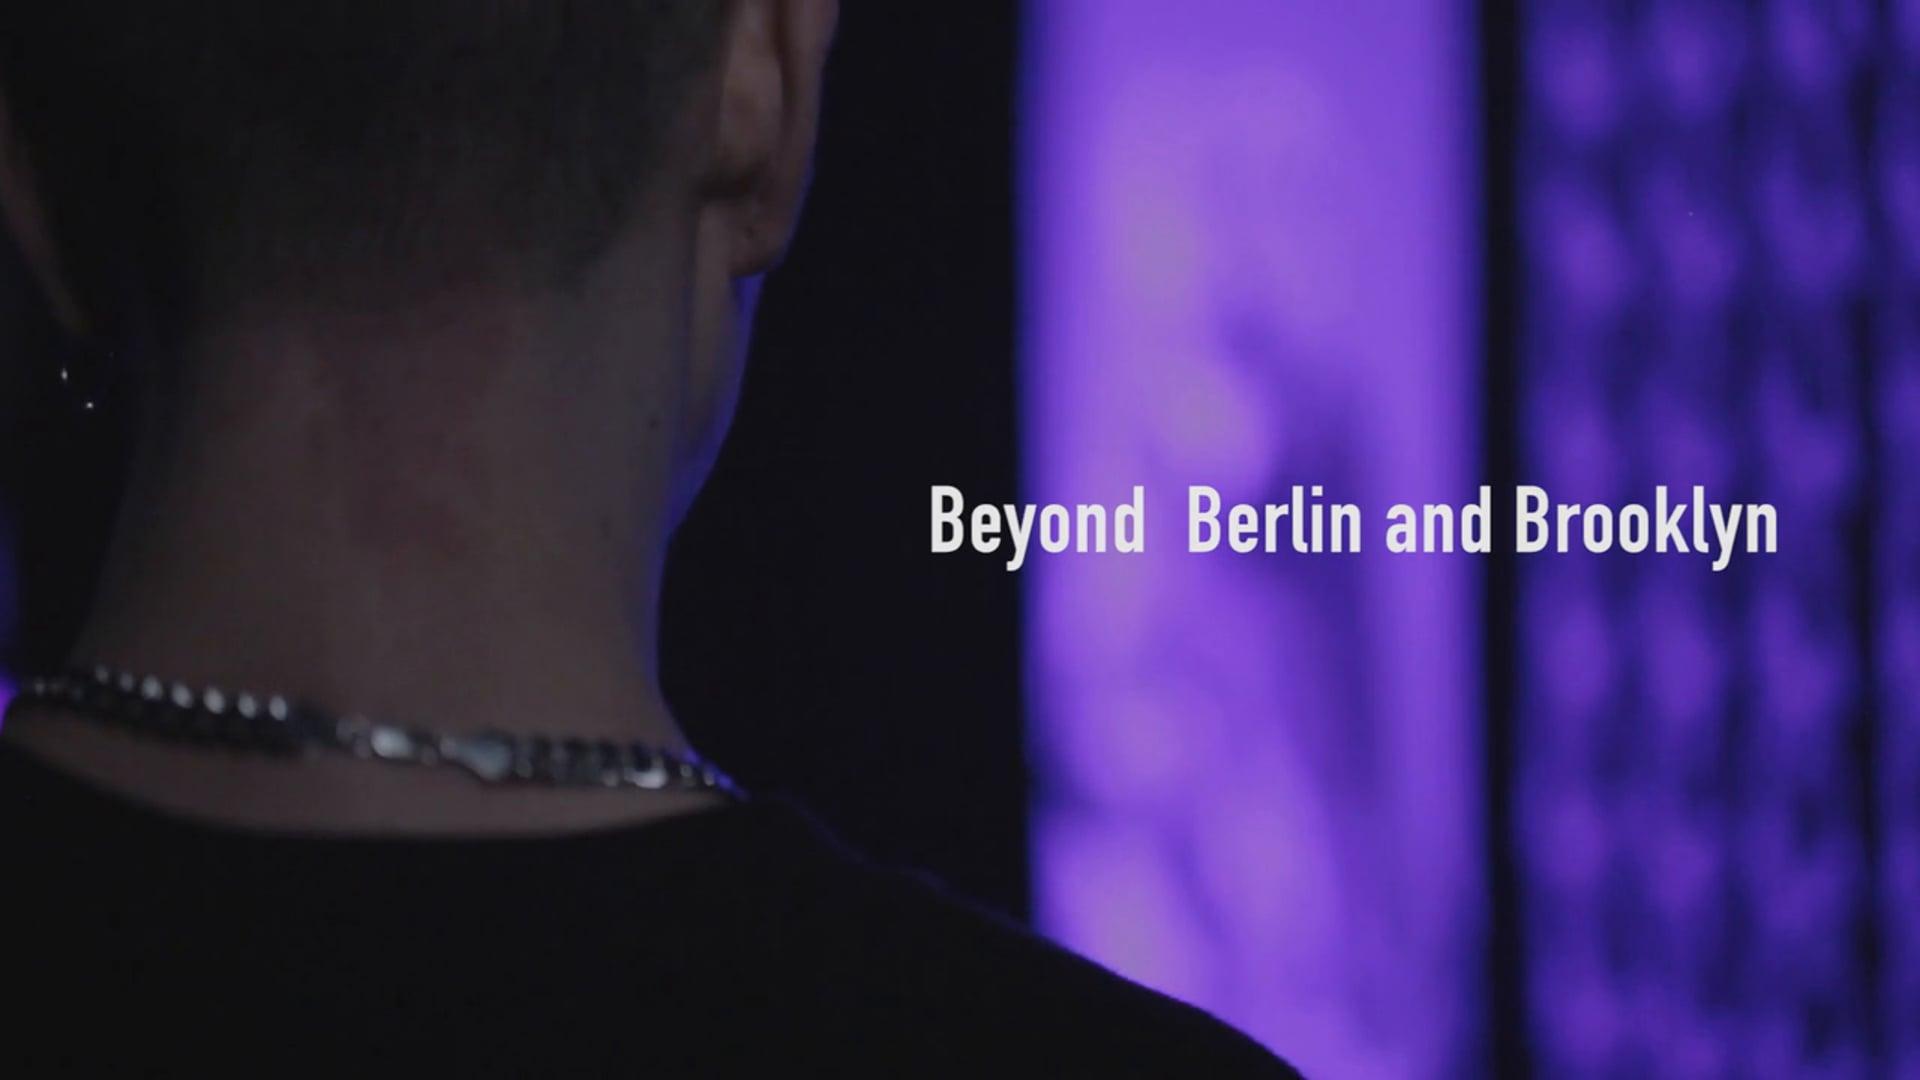 BEYOND BERLIN AND BROOKLYN